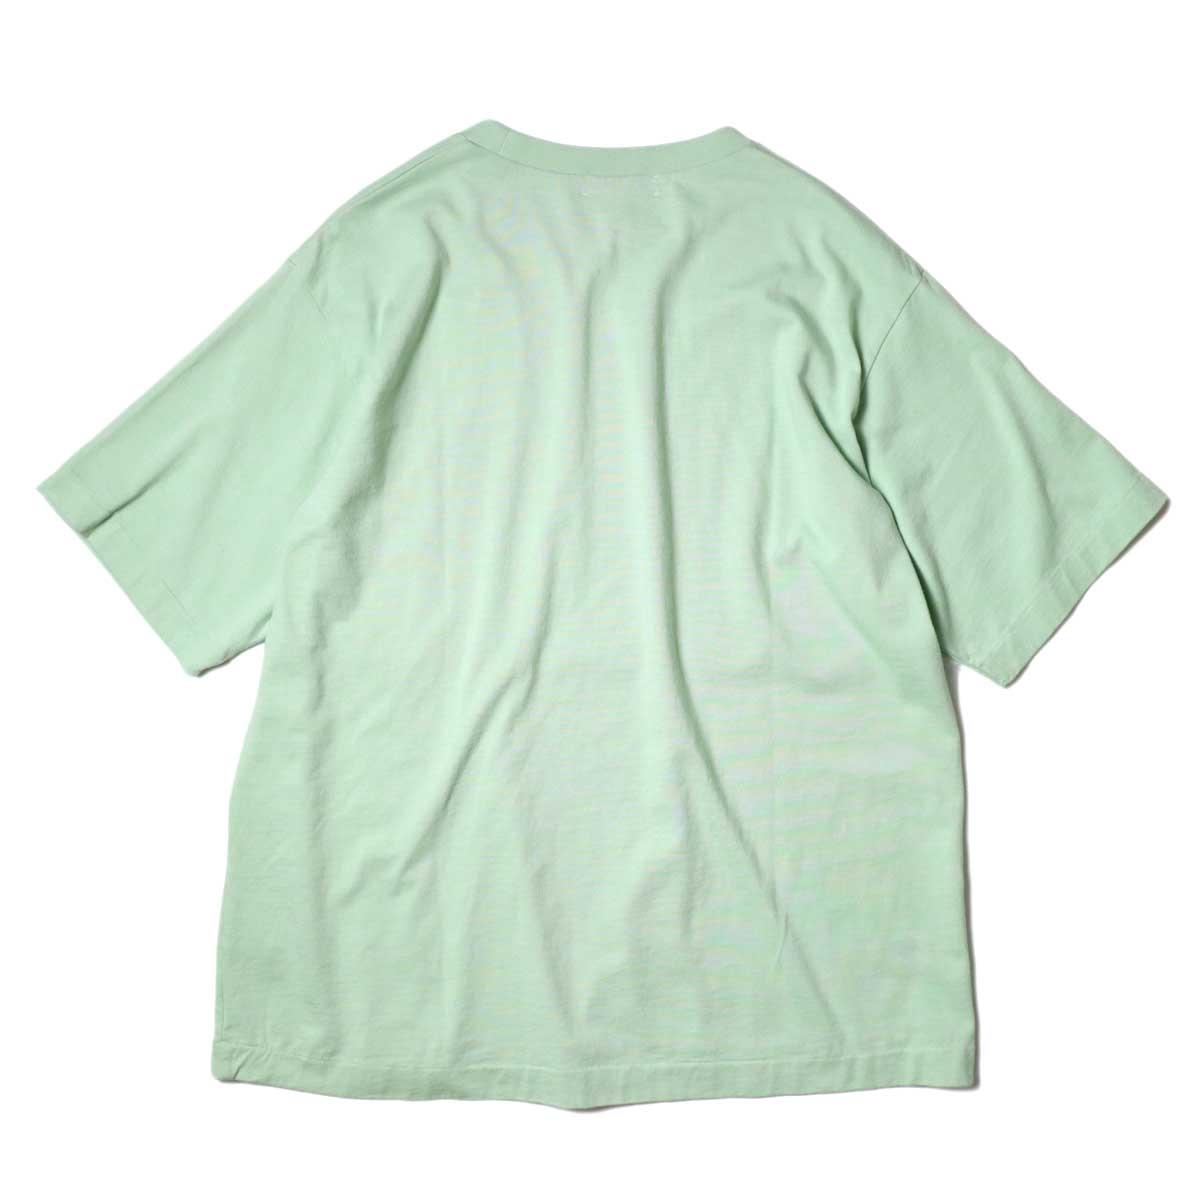 alvana / Dairy Oversize Tee Shirts (Forest Green) 背面